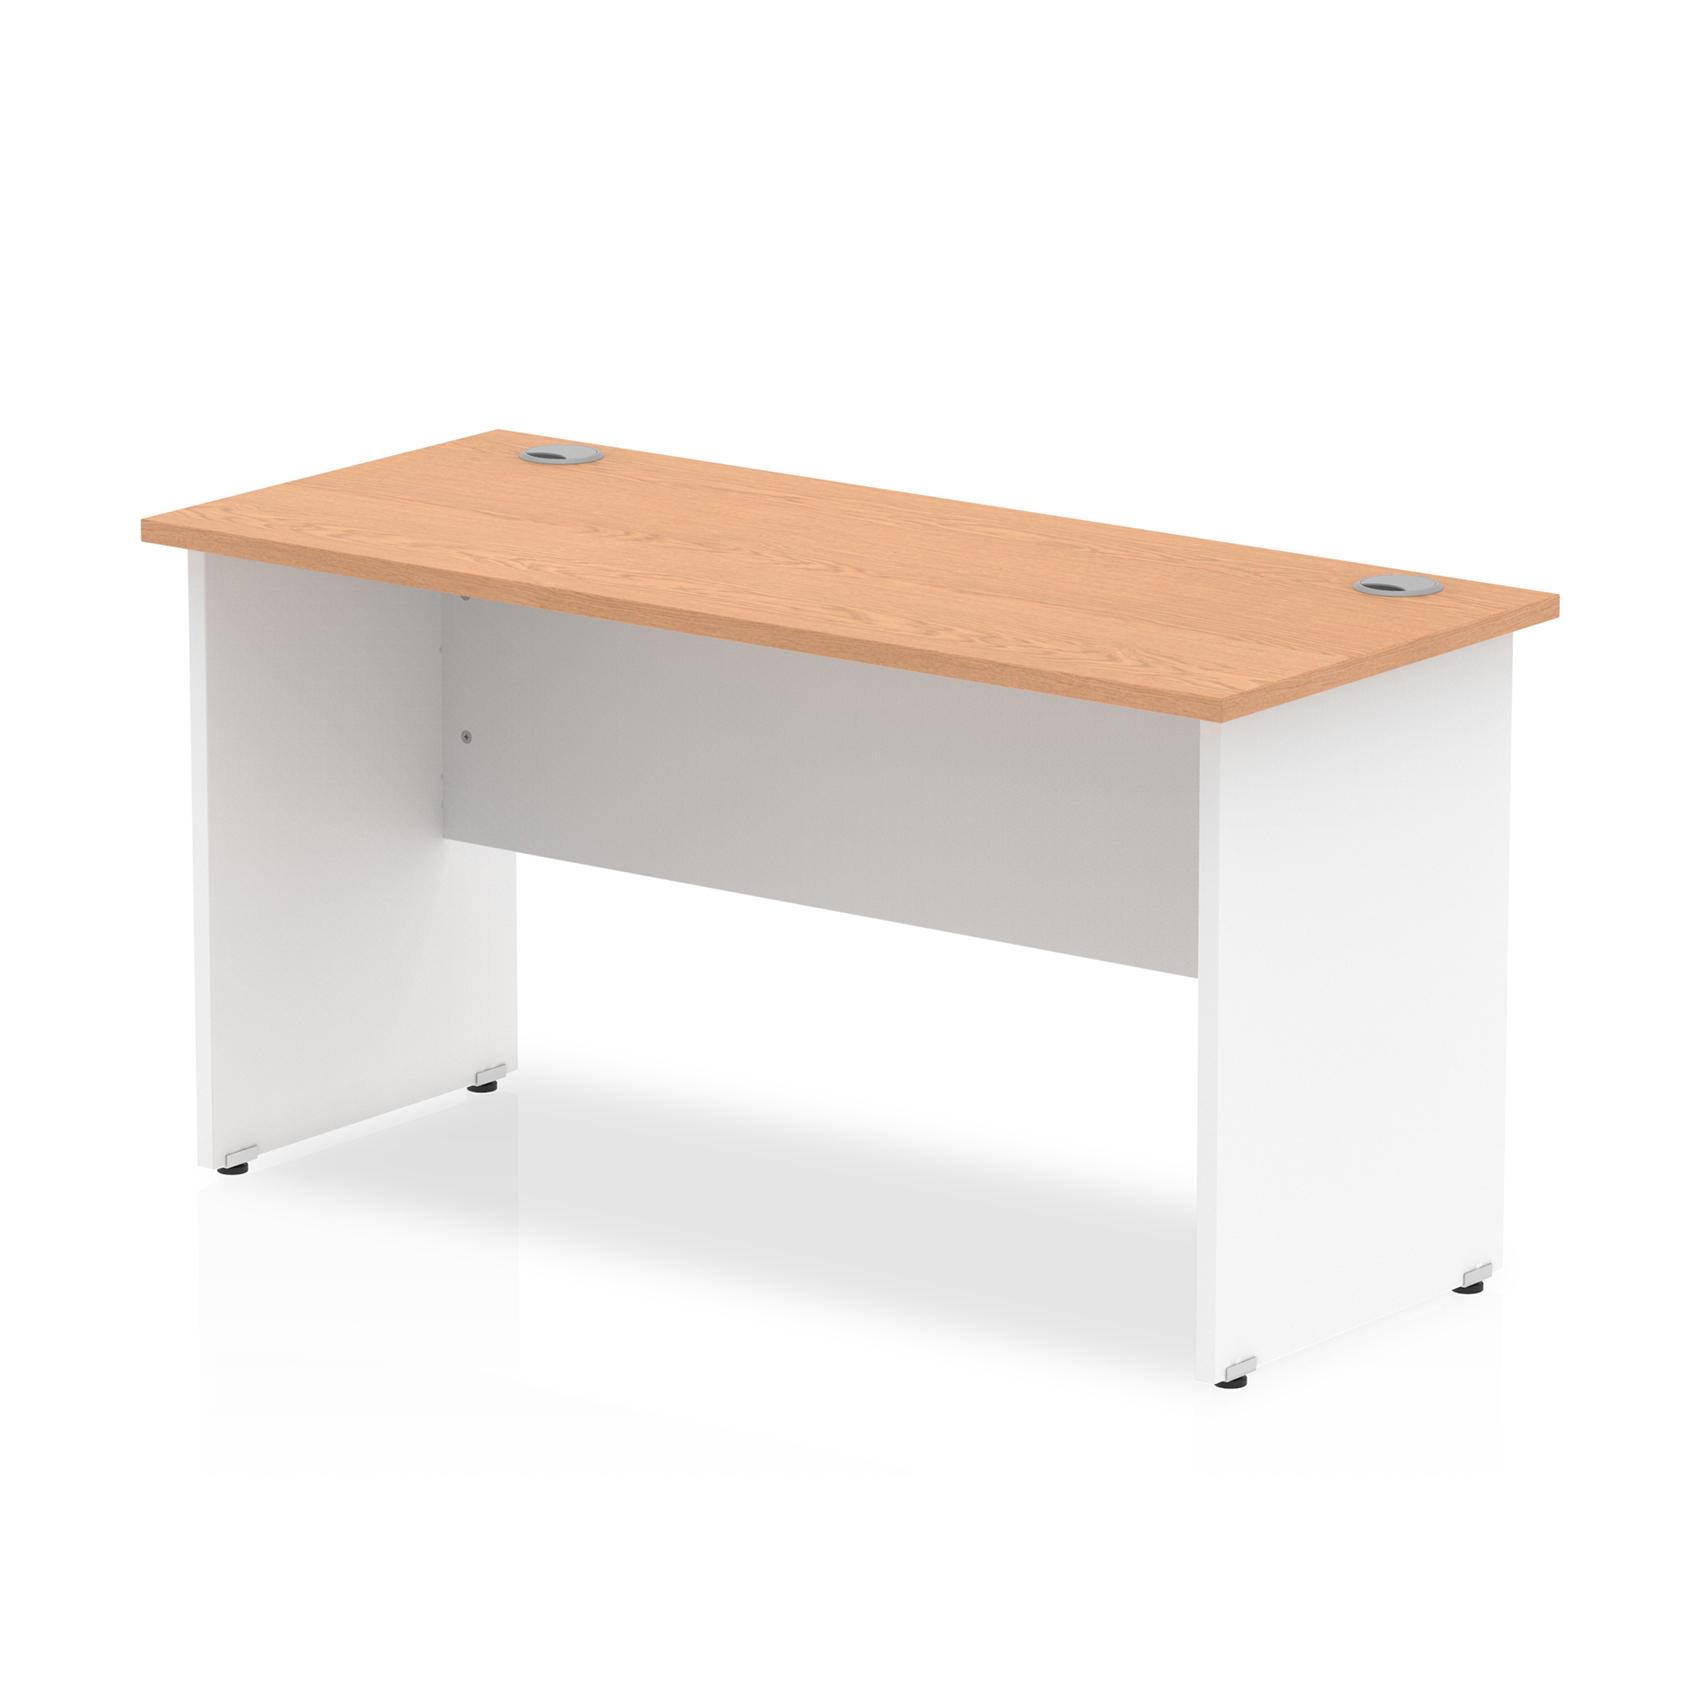 Trexus Desk Rectangle Panel End 1400x600mm Oak Top White Panels Ref TT000095